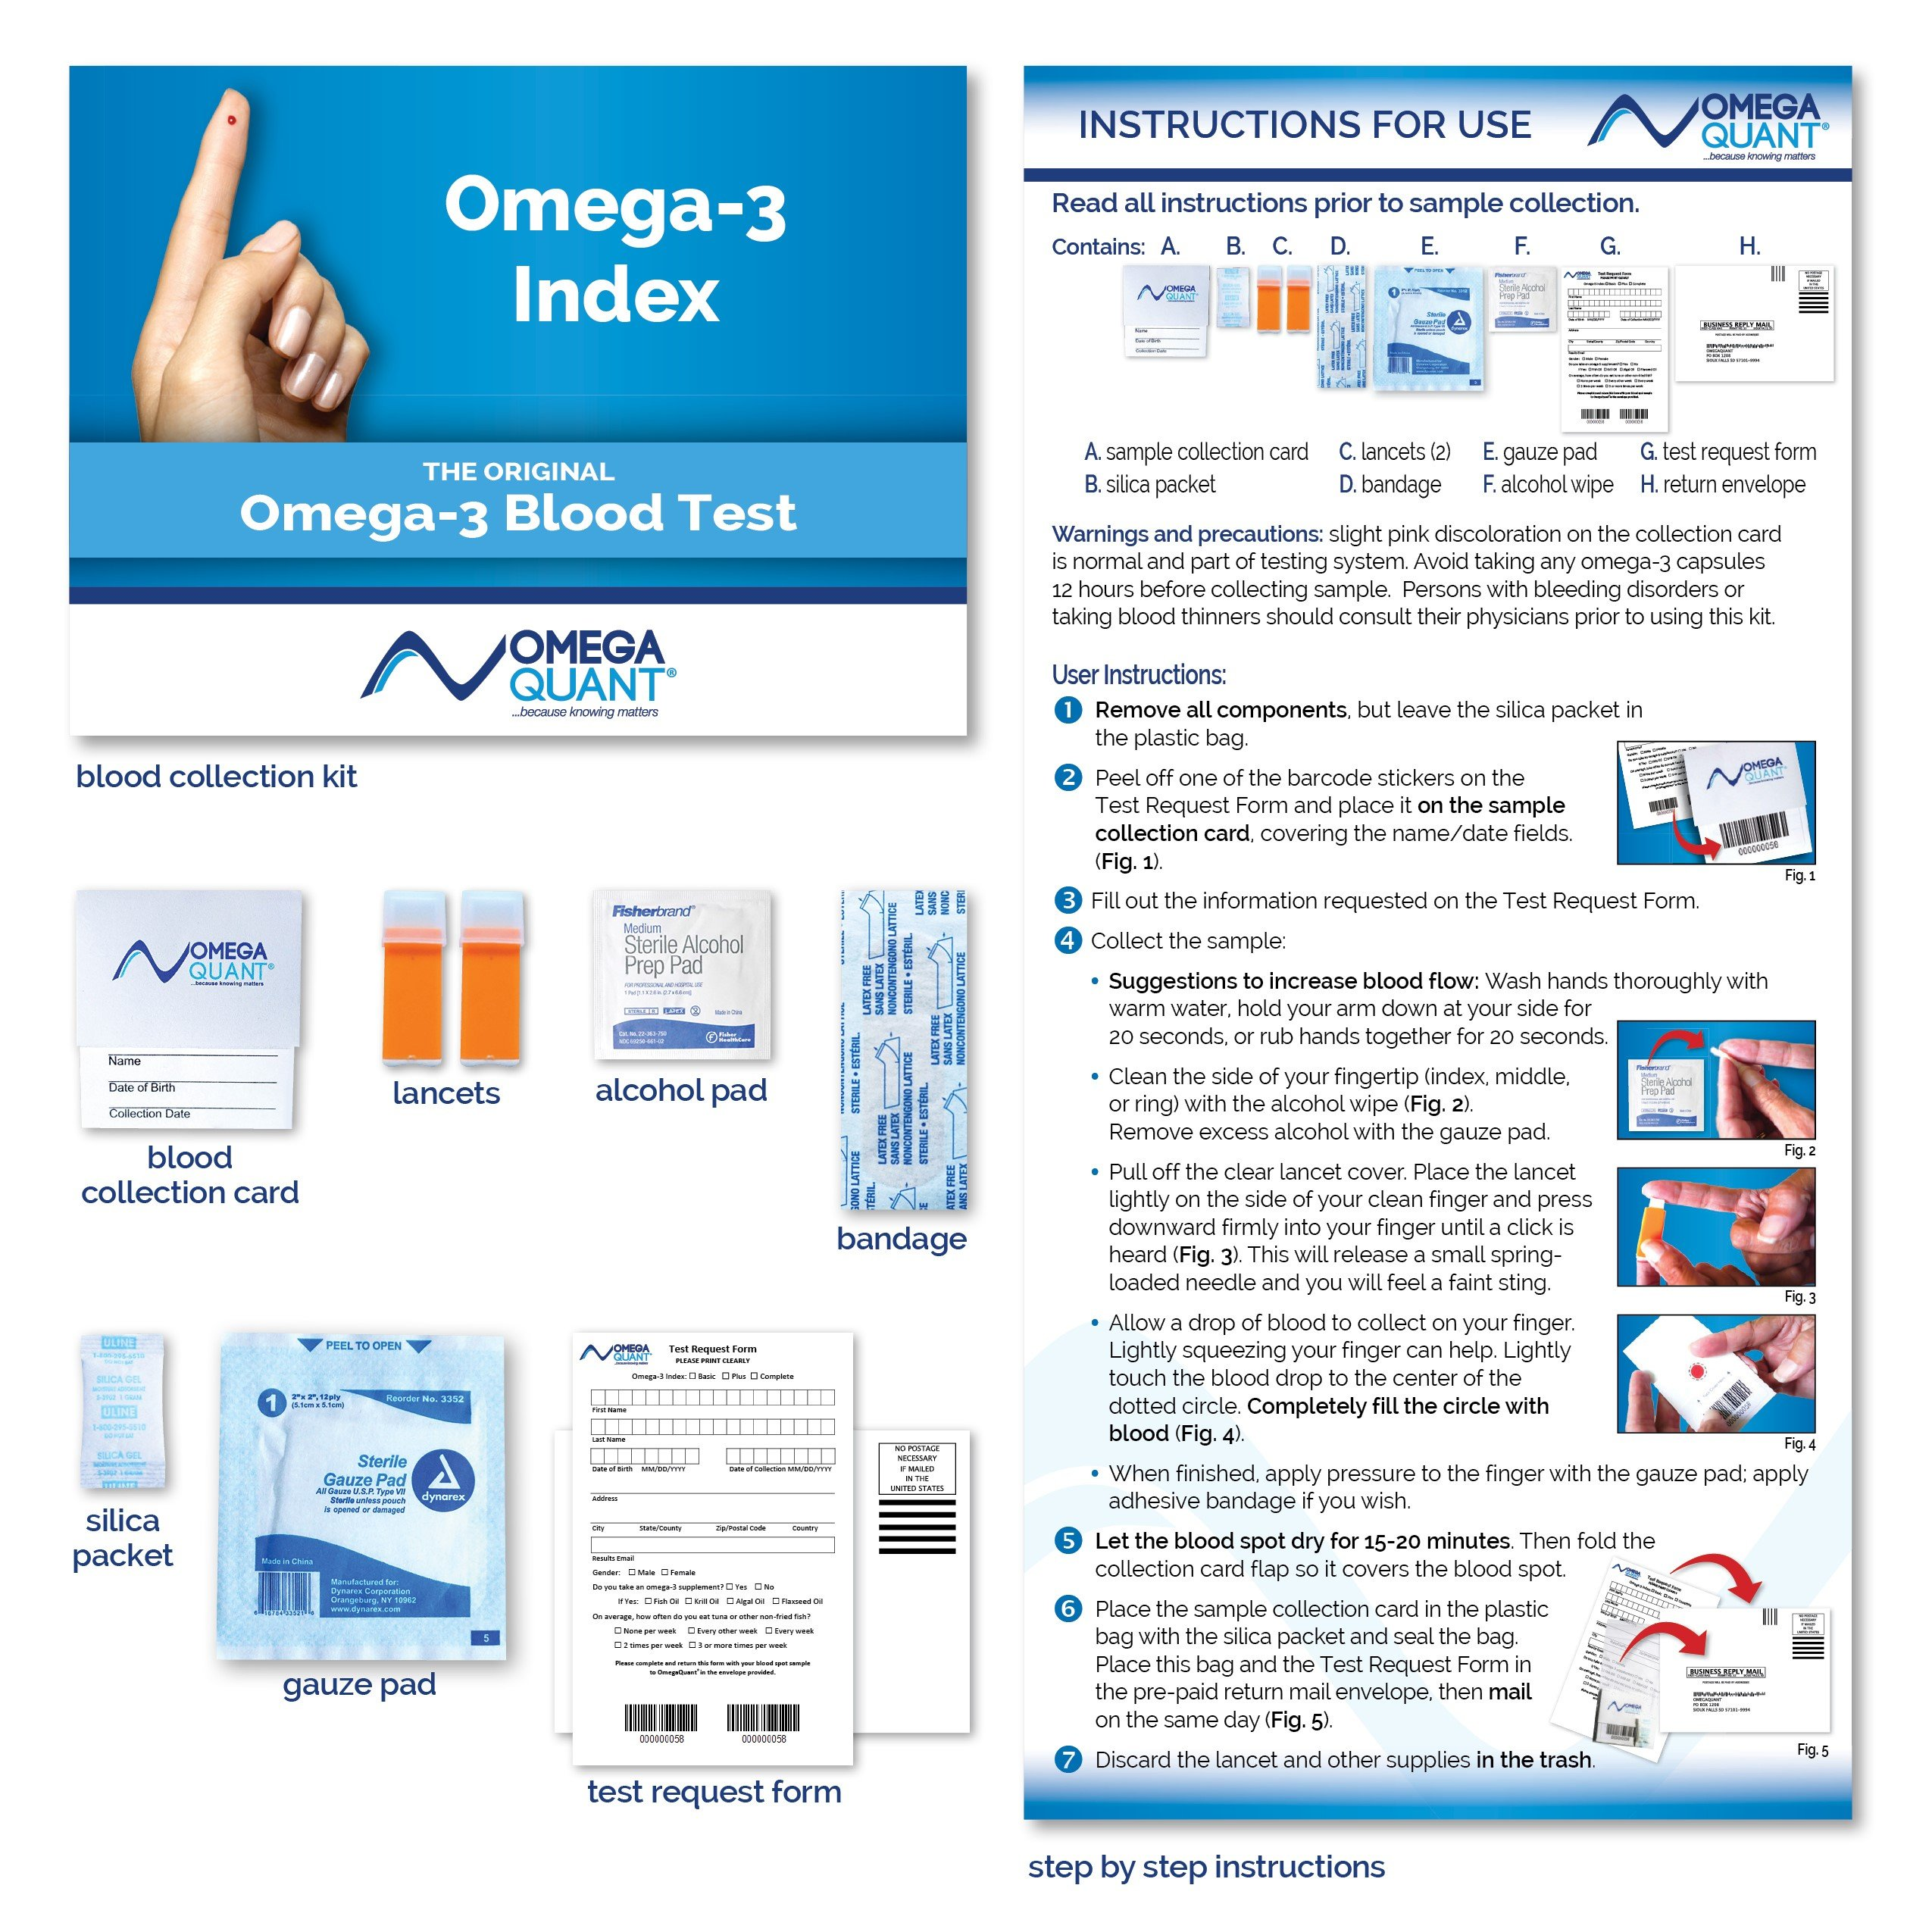 Omega-3 Index Basic - The Original Omega-3 Blood Test with one drop of blood.